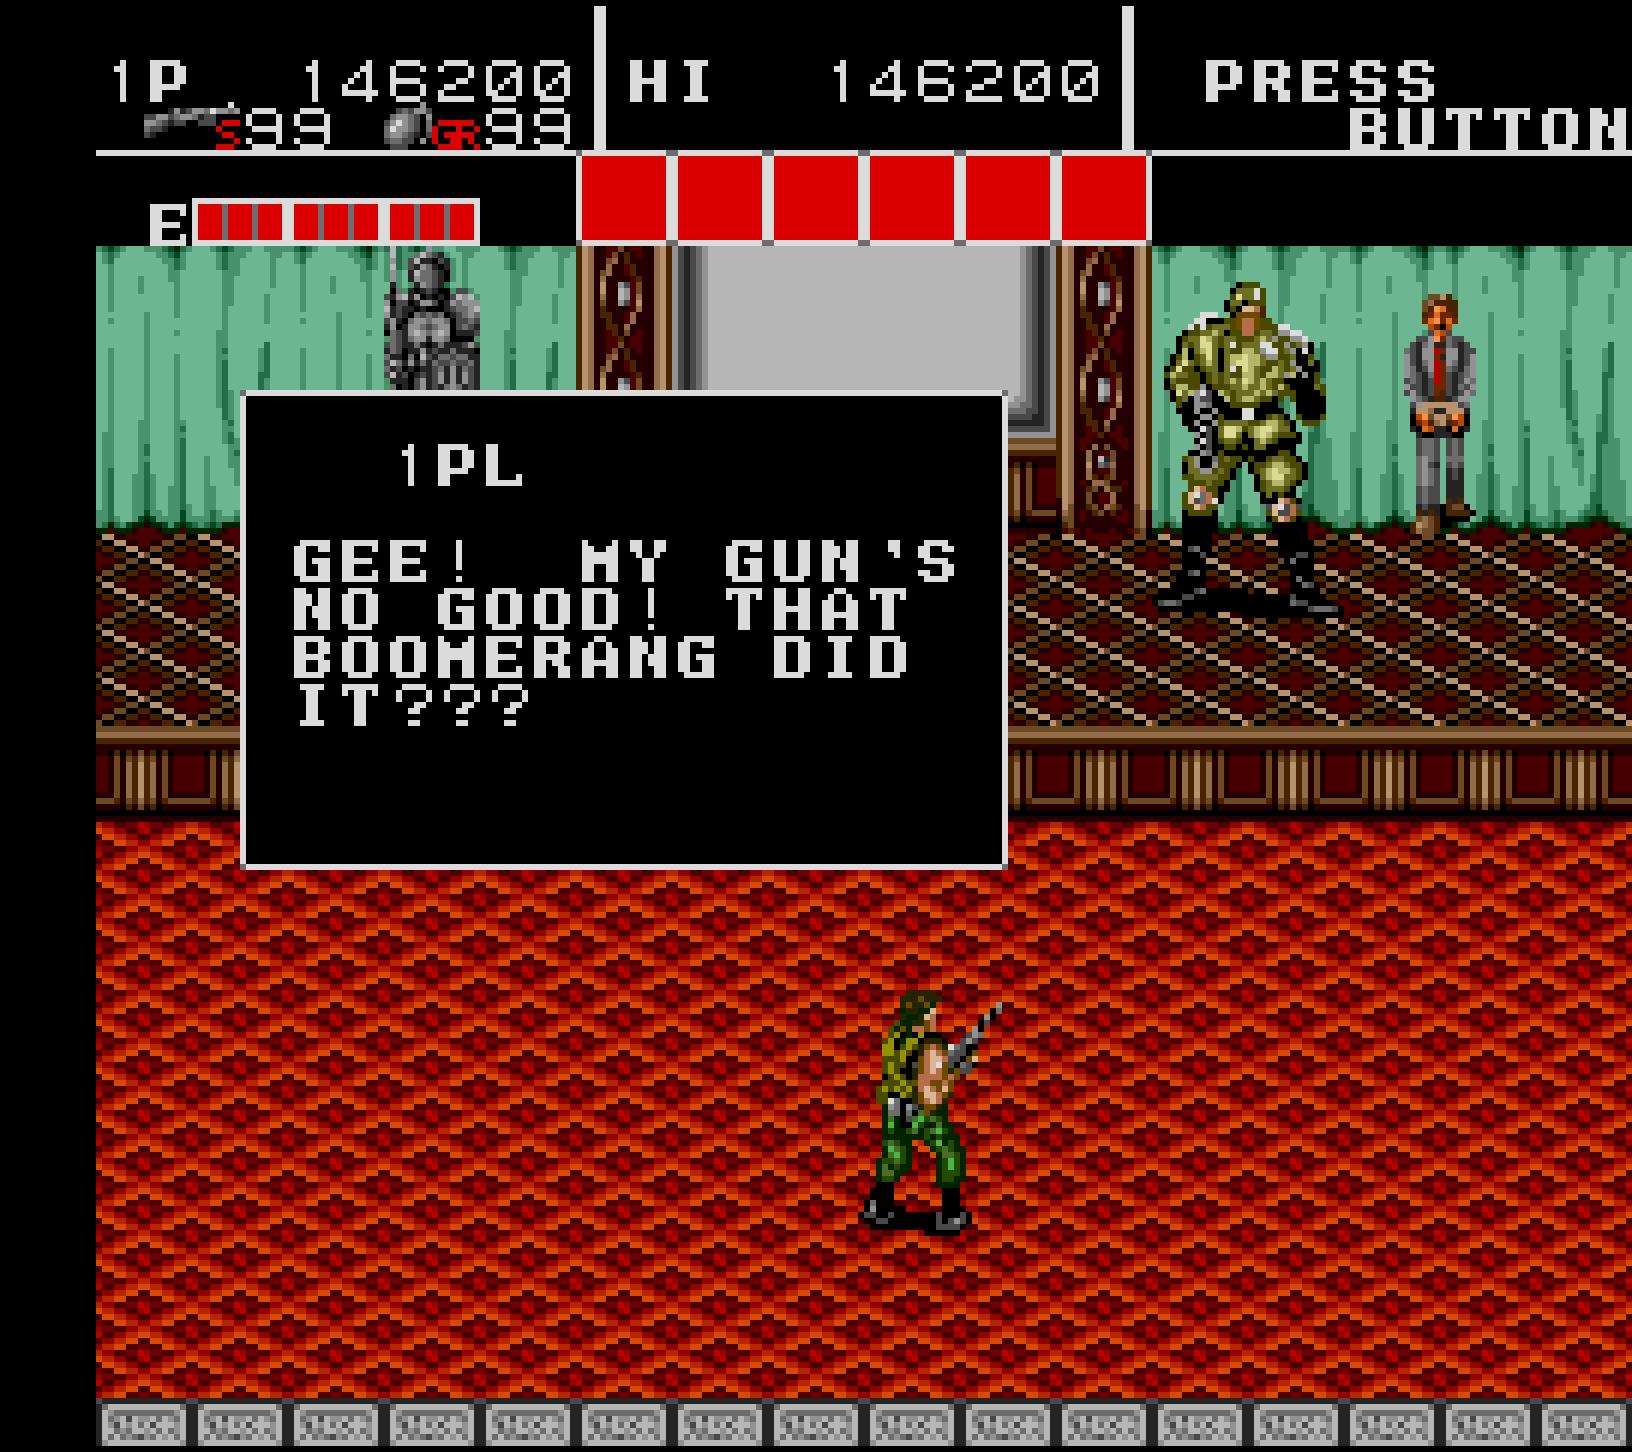 Gee! My gun's no good! That boomerang did it???